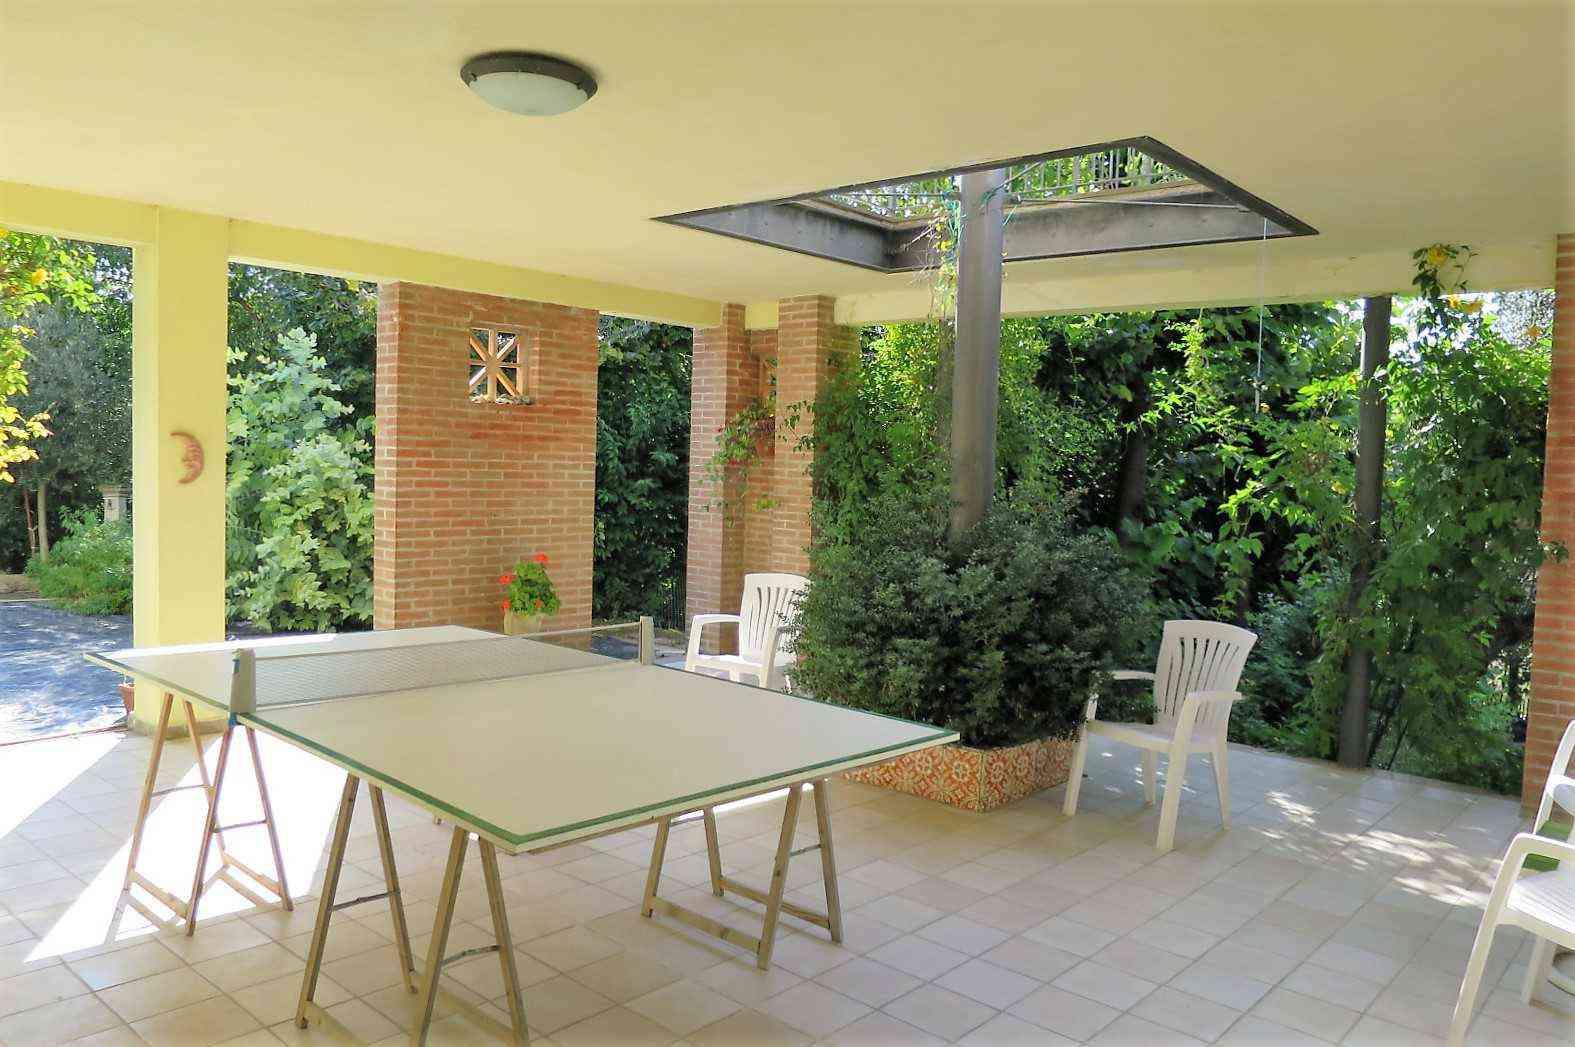 Villa Villa in vendita Atri (TE), Villa Paola - Atri - EUR 473.281 140